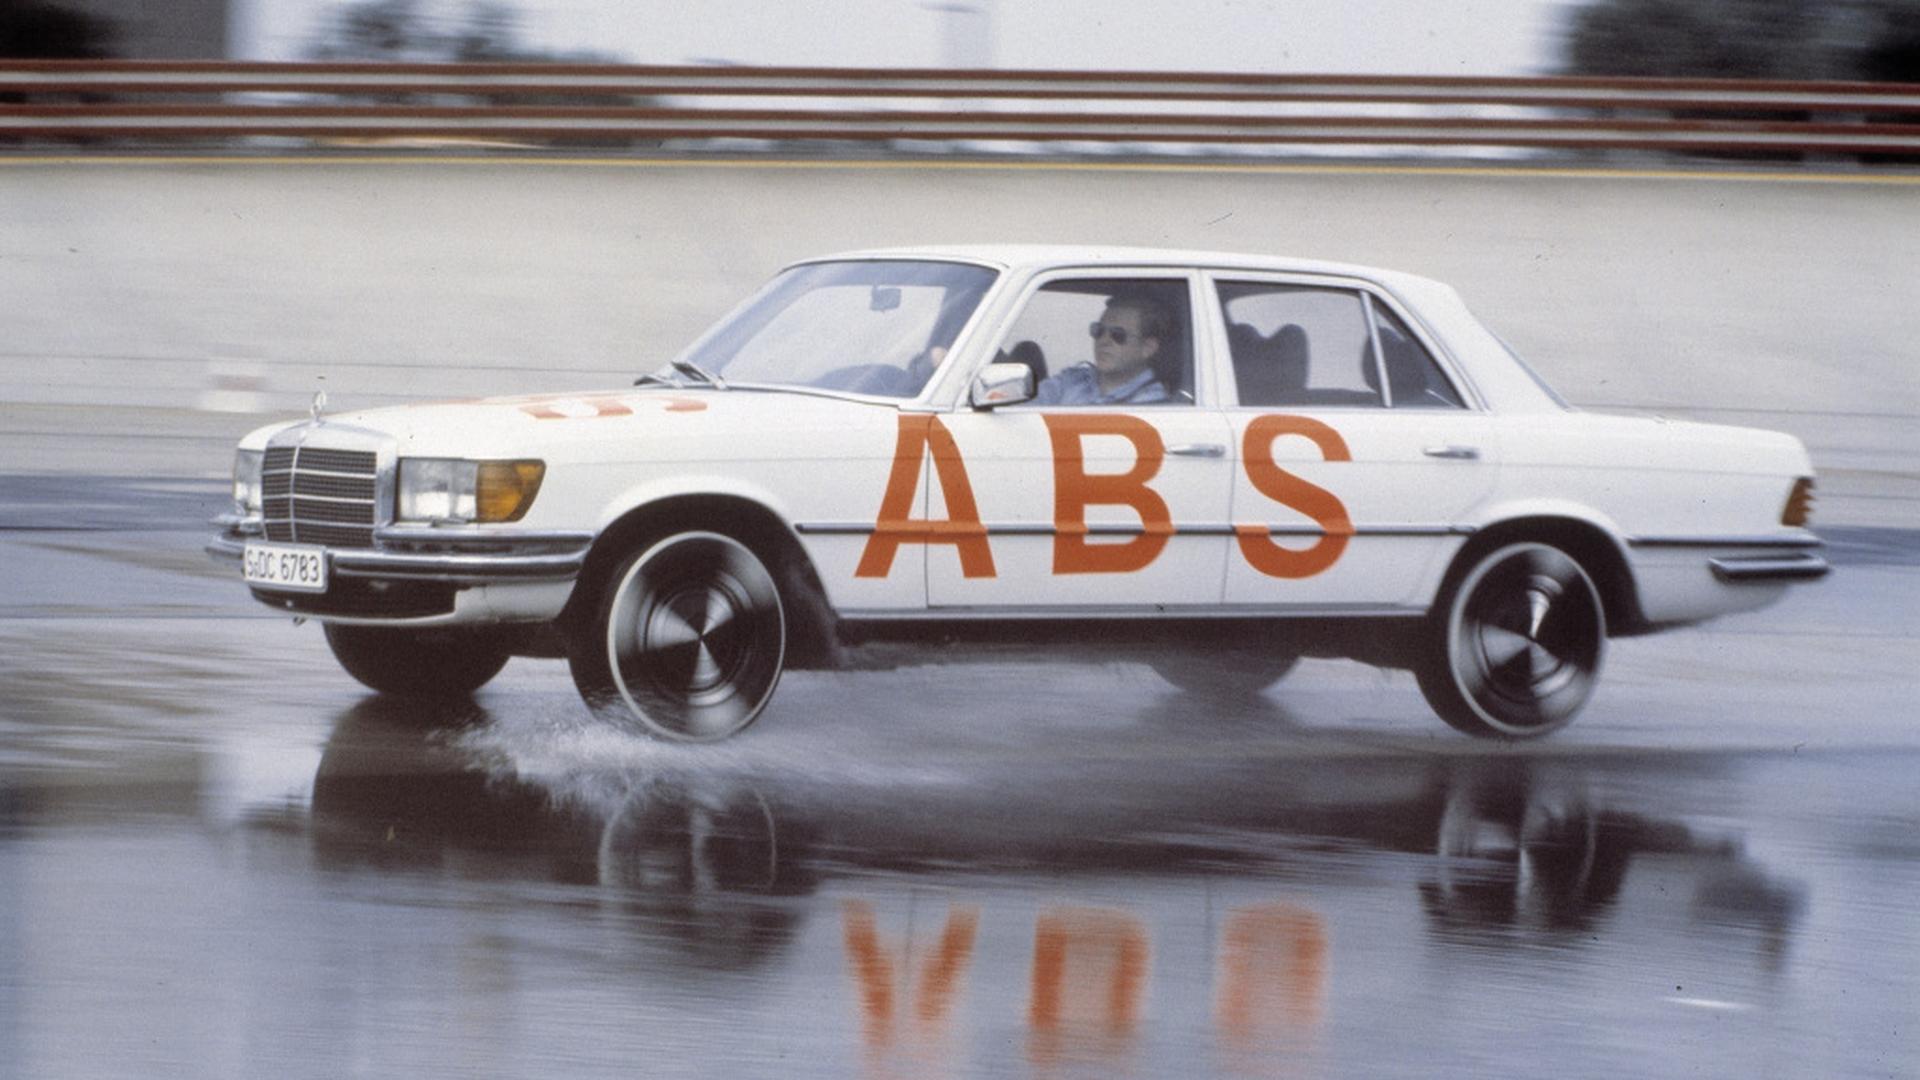 uklad-abs-konczy-40-lat-01jpg.jpg